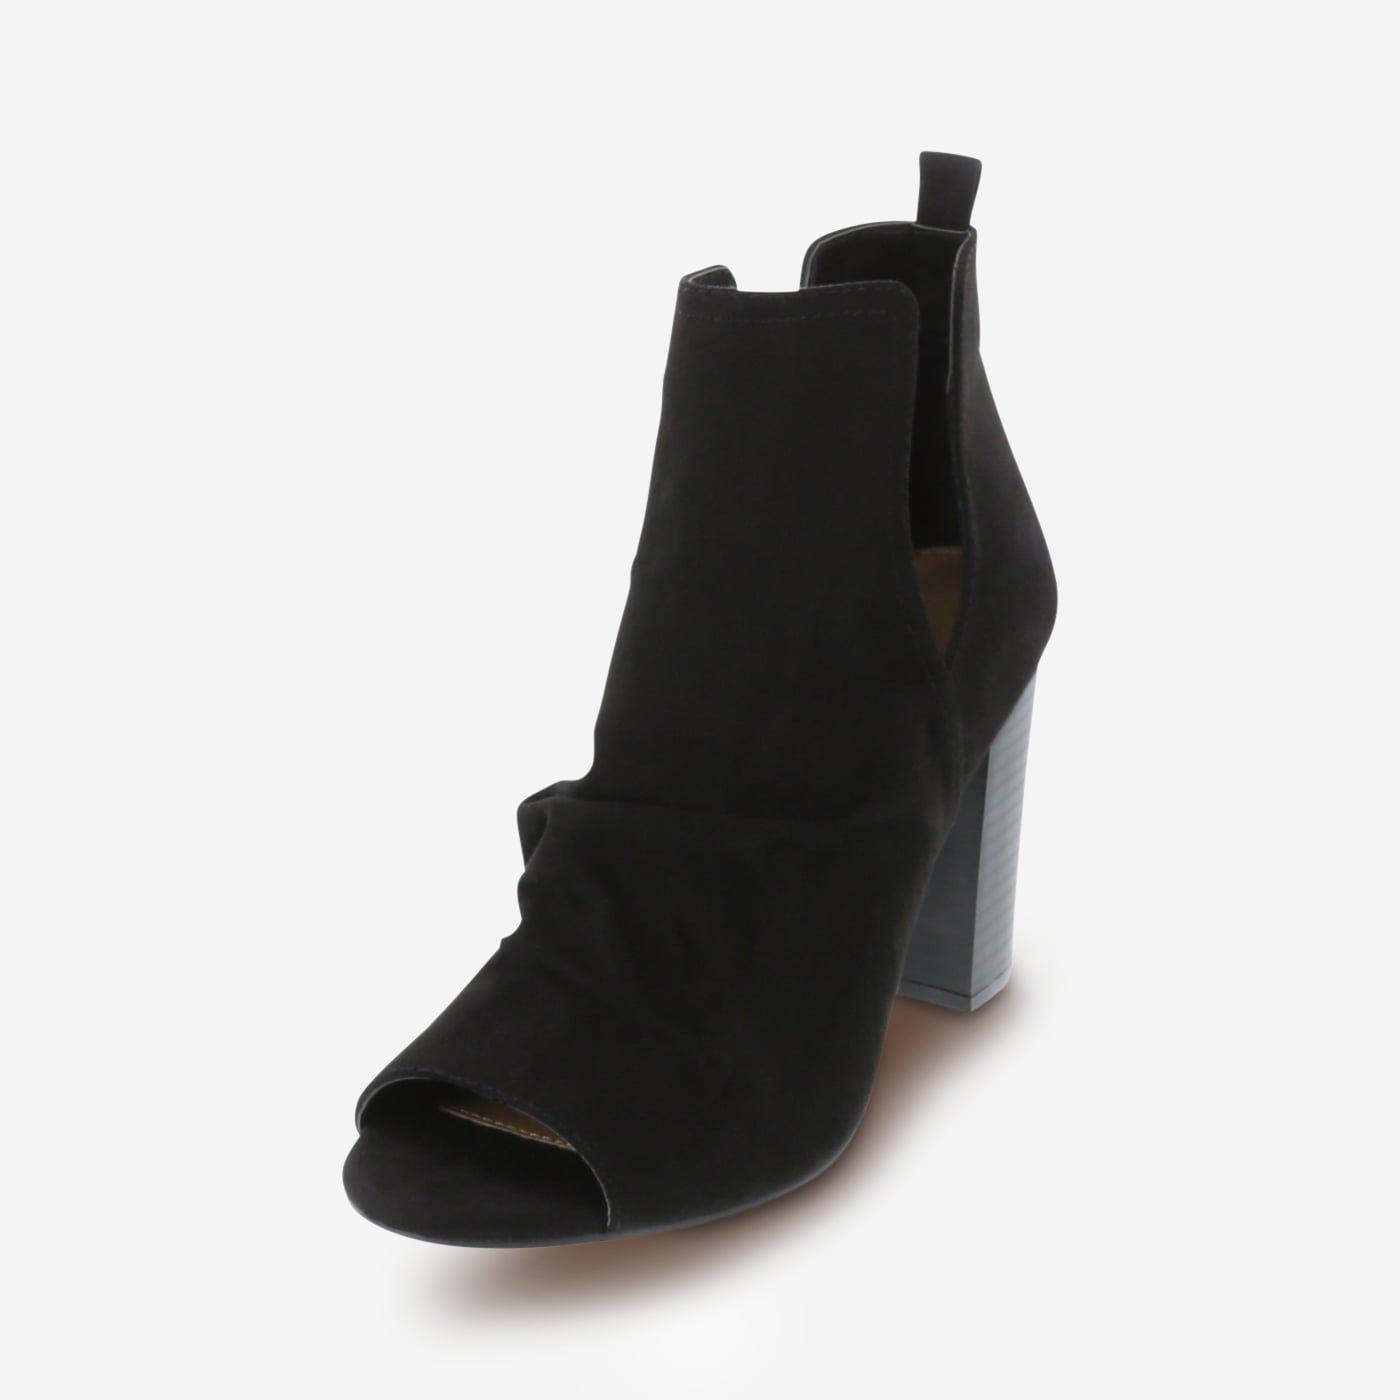 Brash Samika Women's Peep-Toe Boot Shoe